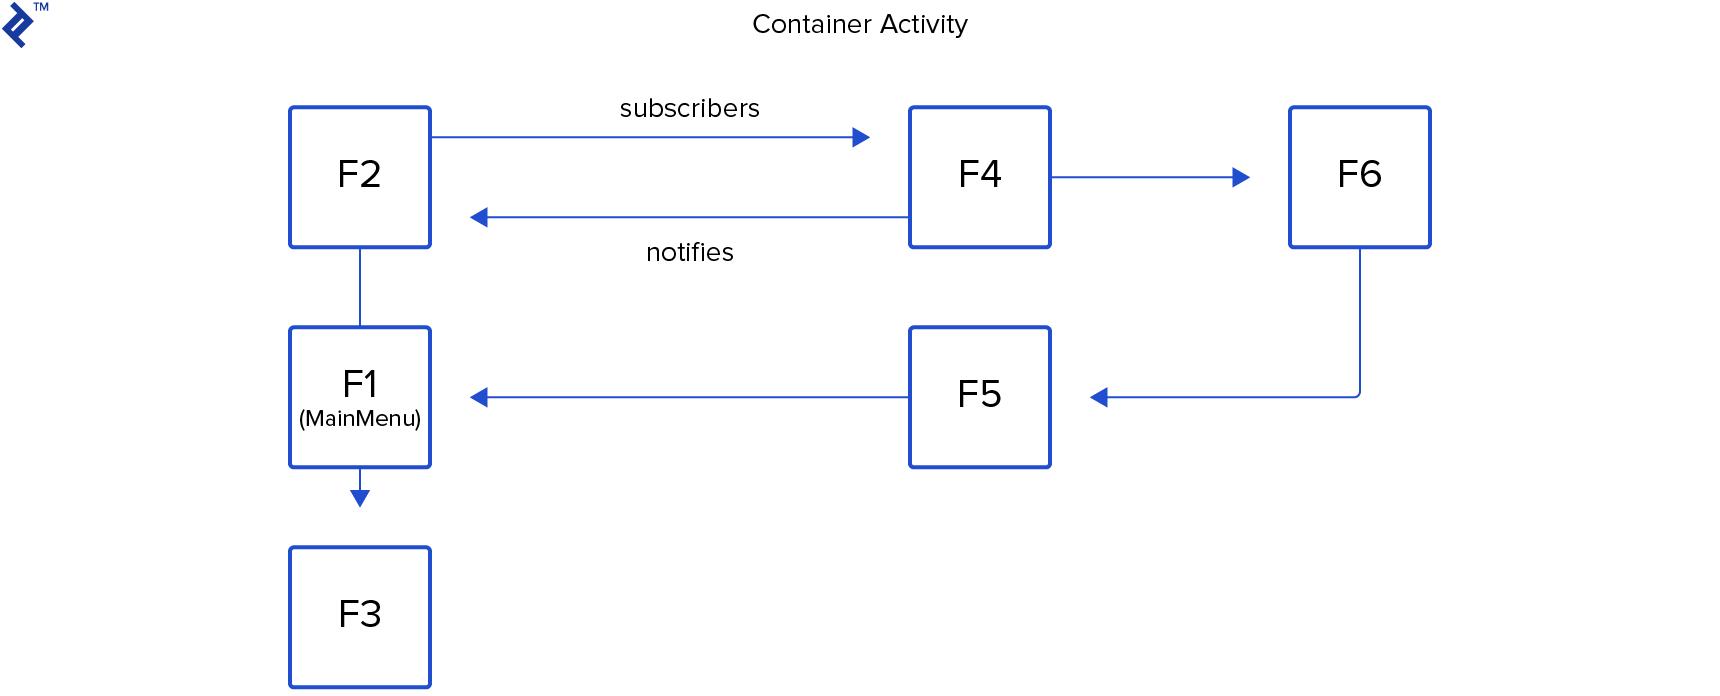 Framgnet image 3